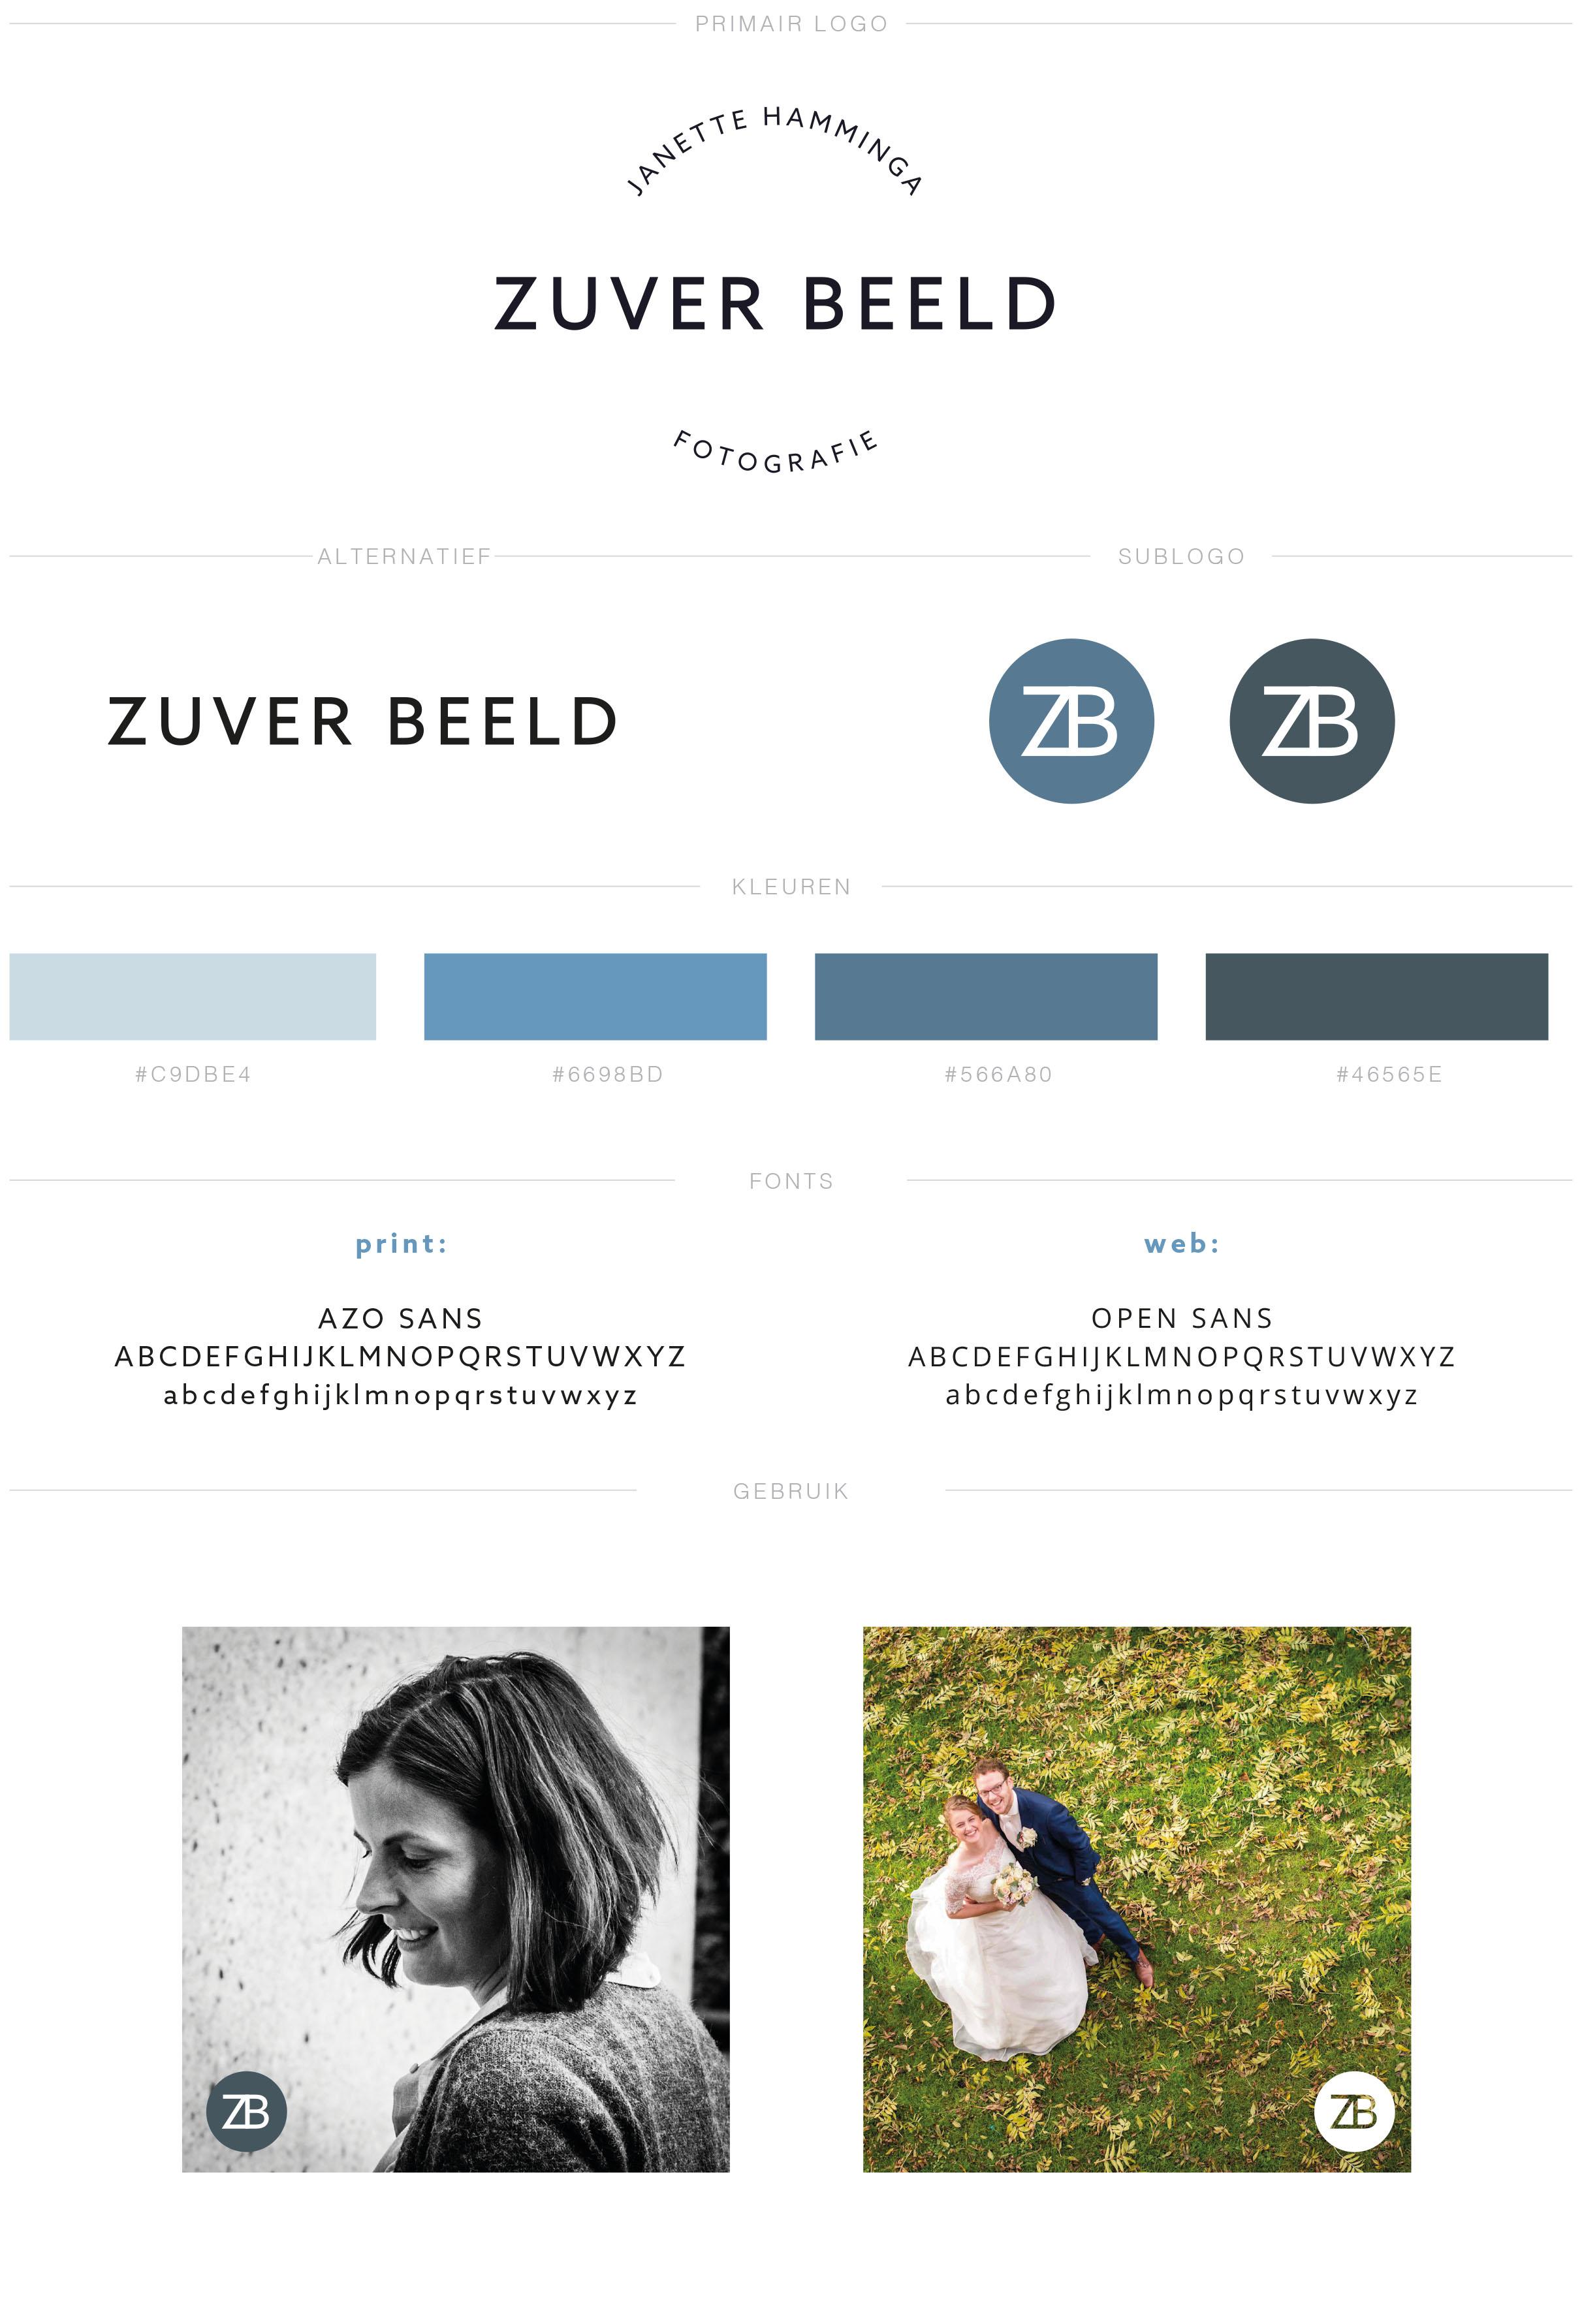 Brandboard-Zuver Beeld.jpg